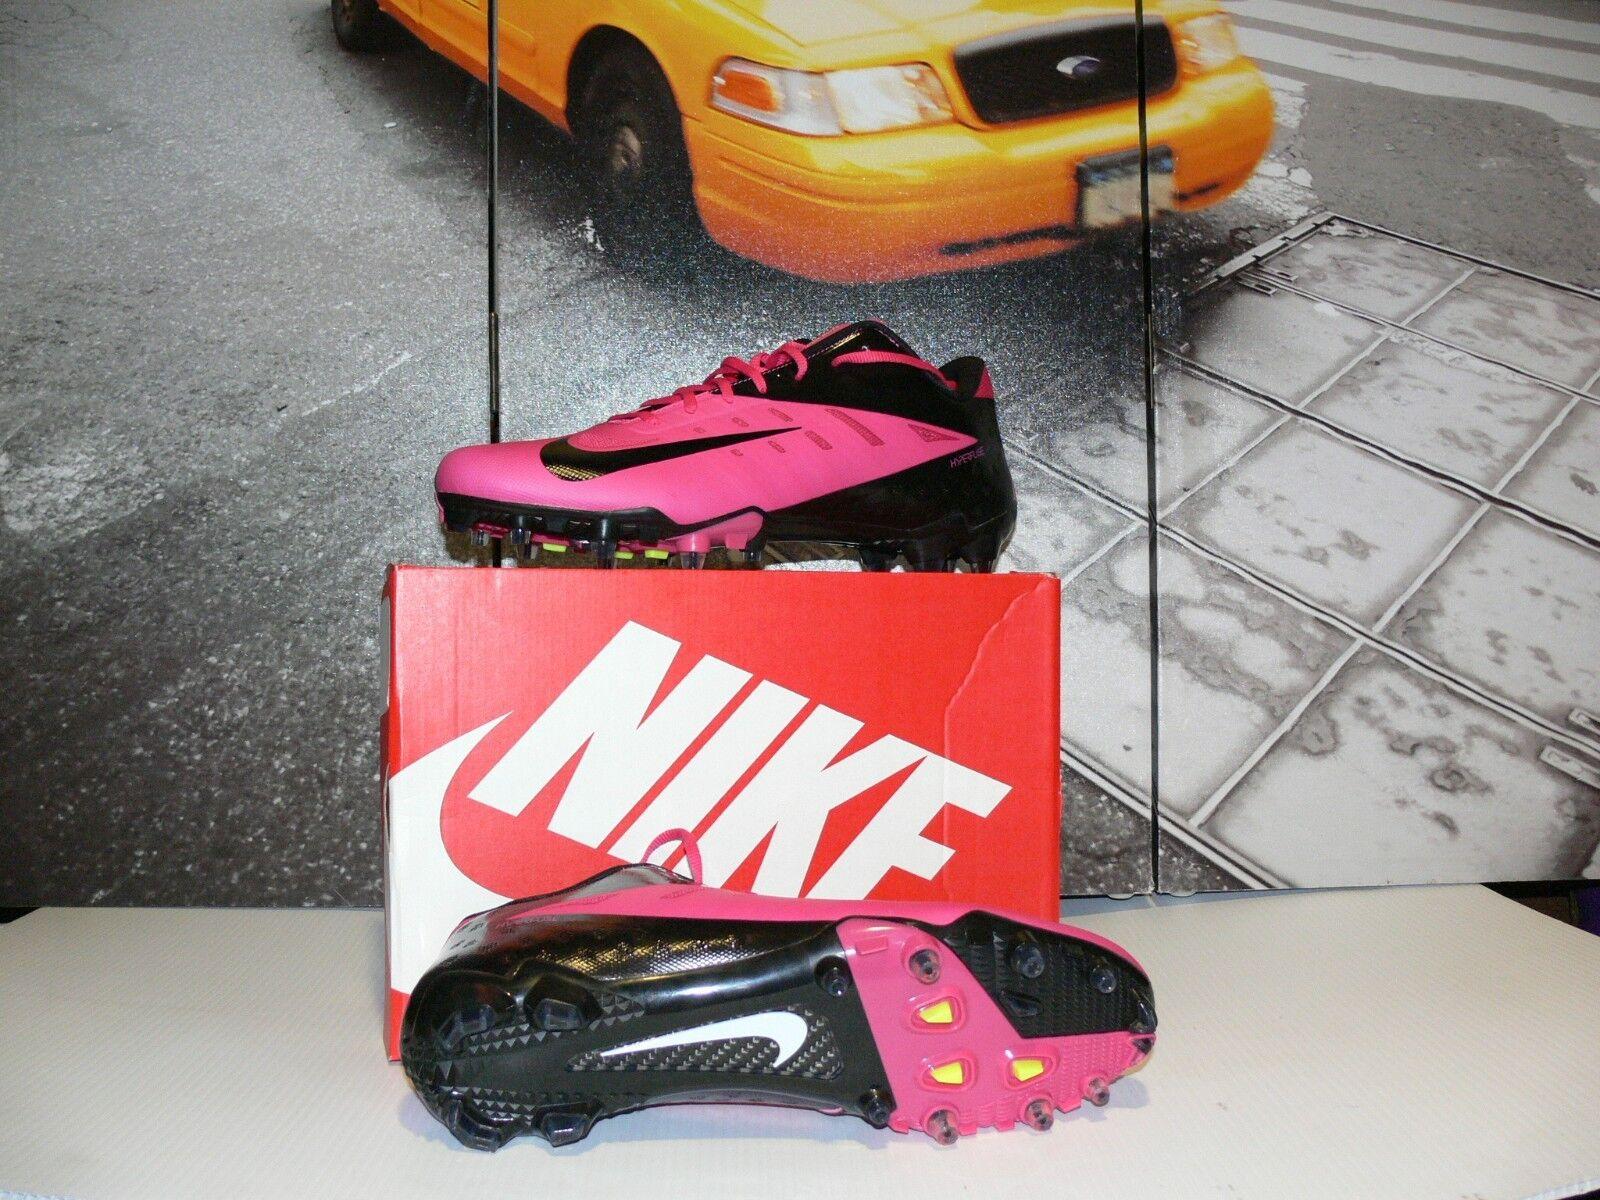 140 bajo Nike Vapor Talon Elite bajo 140 TD fútbol tacos 500068-600 hombres nos 14 / 97f7c1